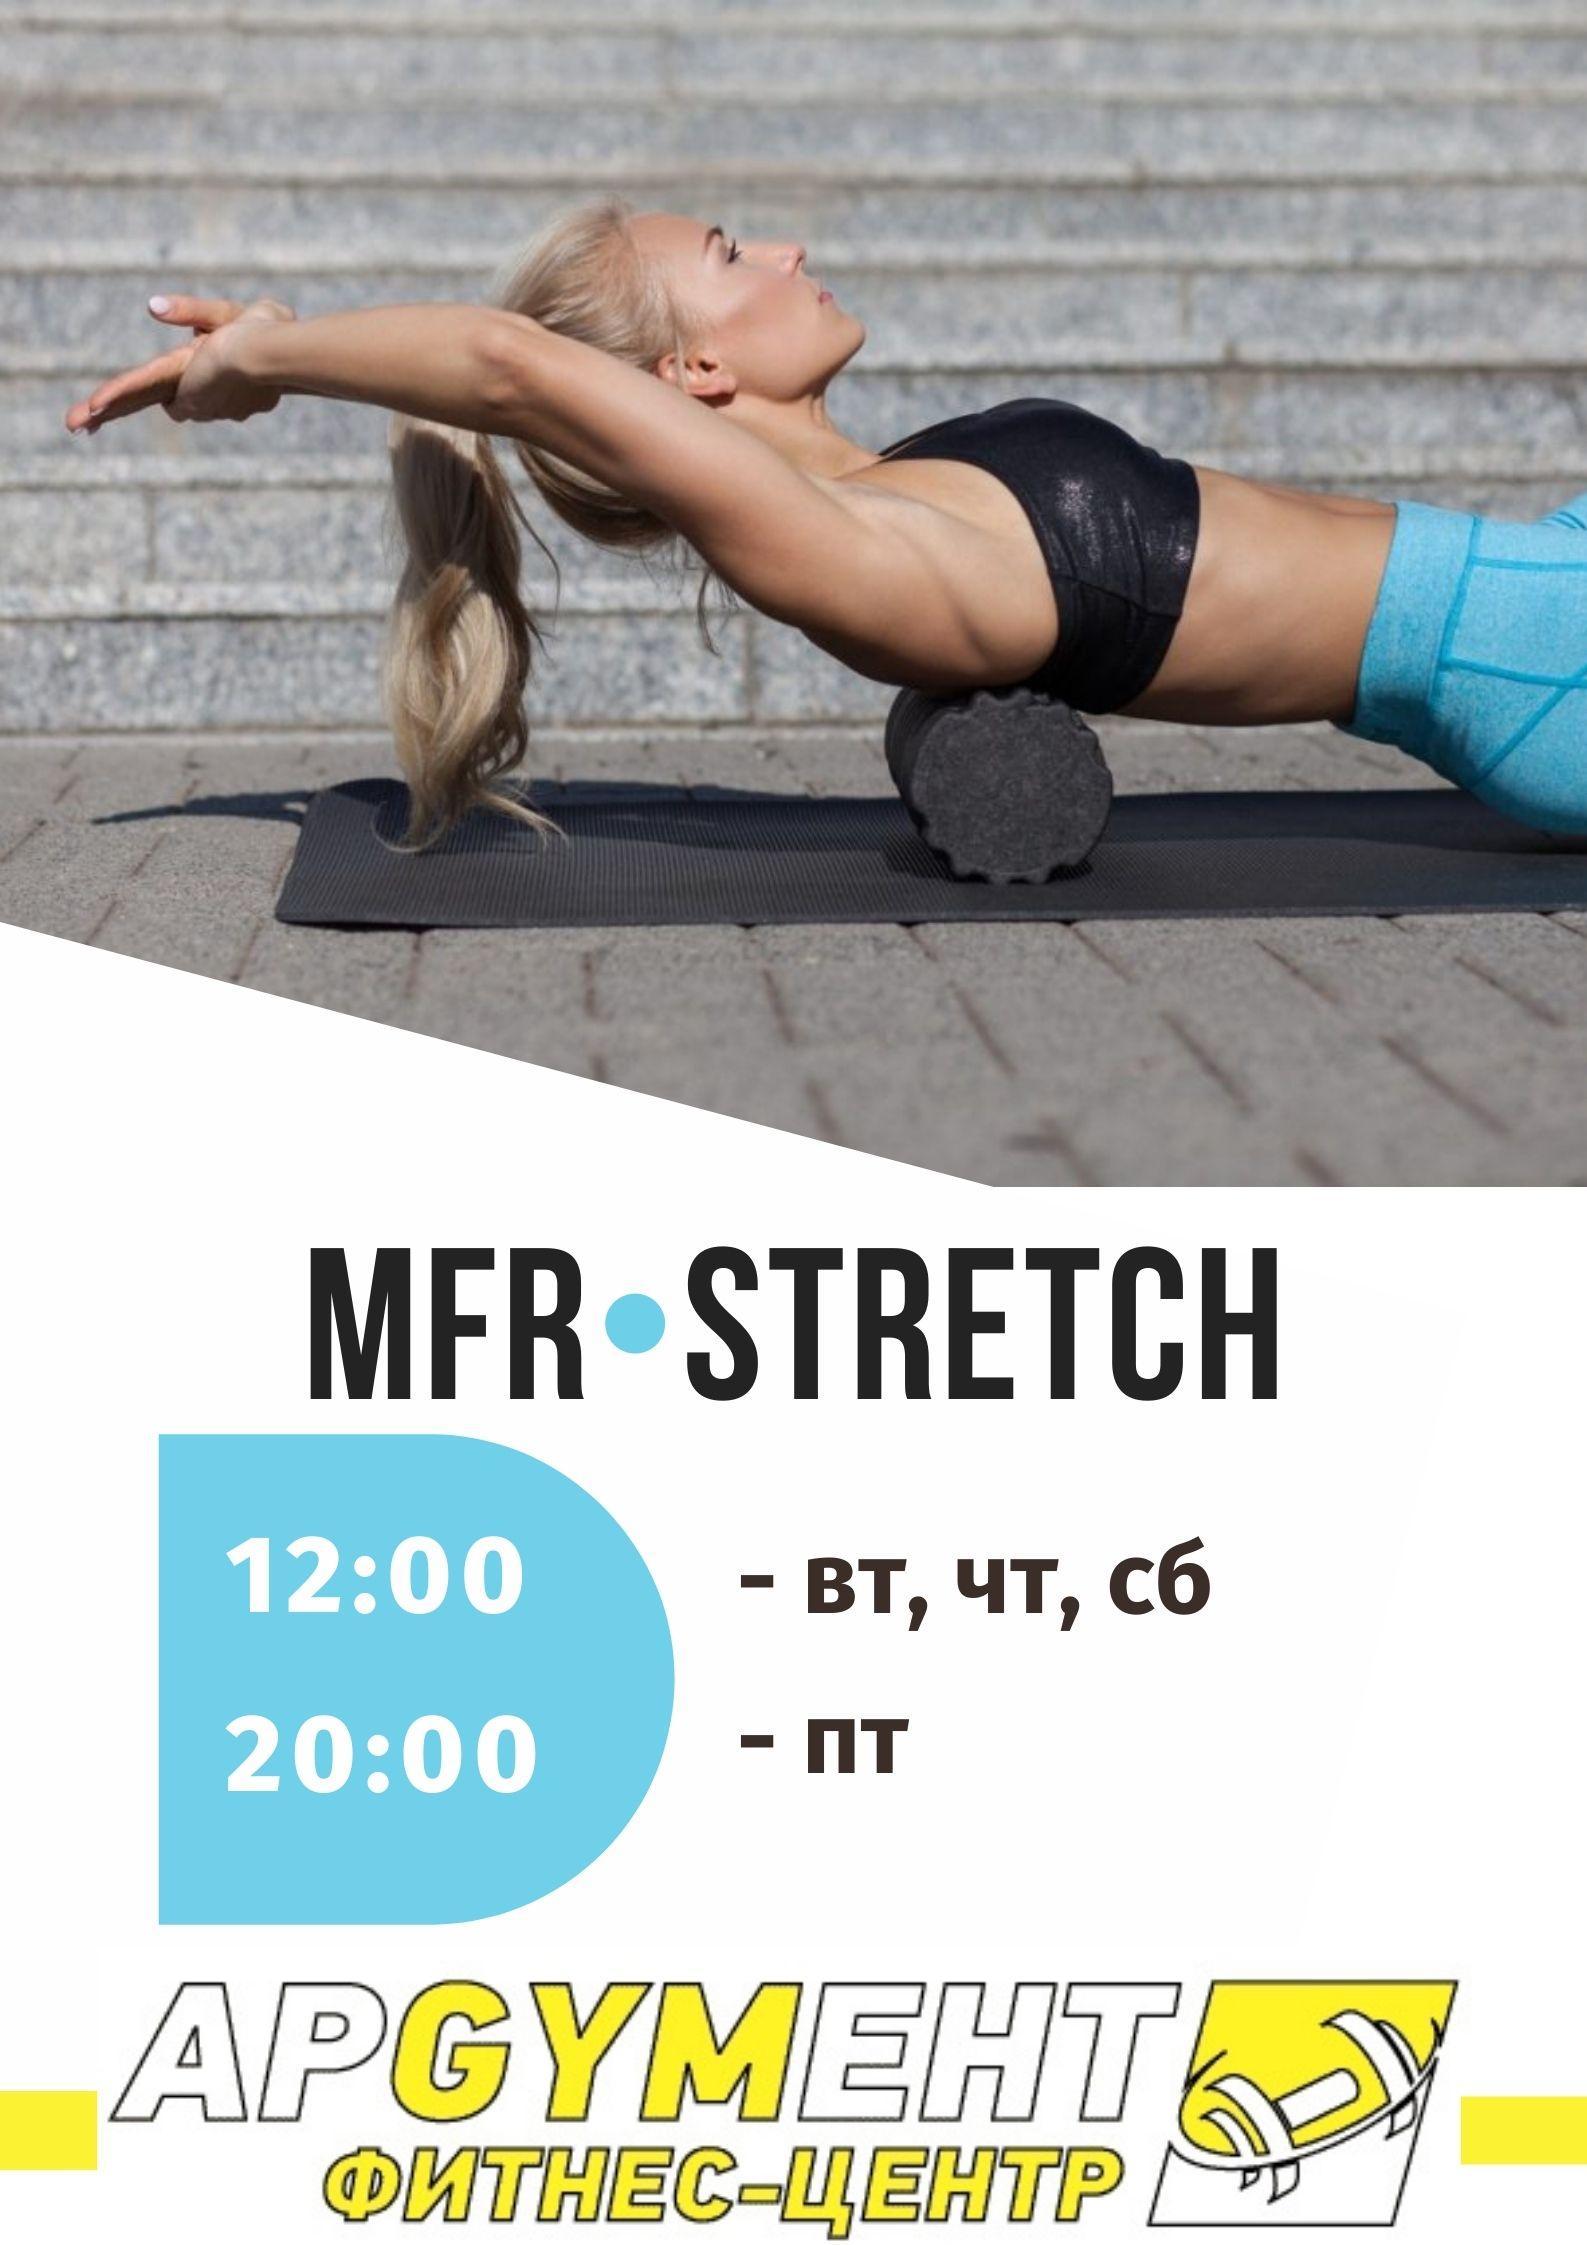 MFRstretch